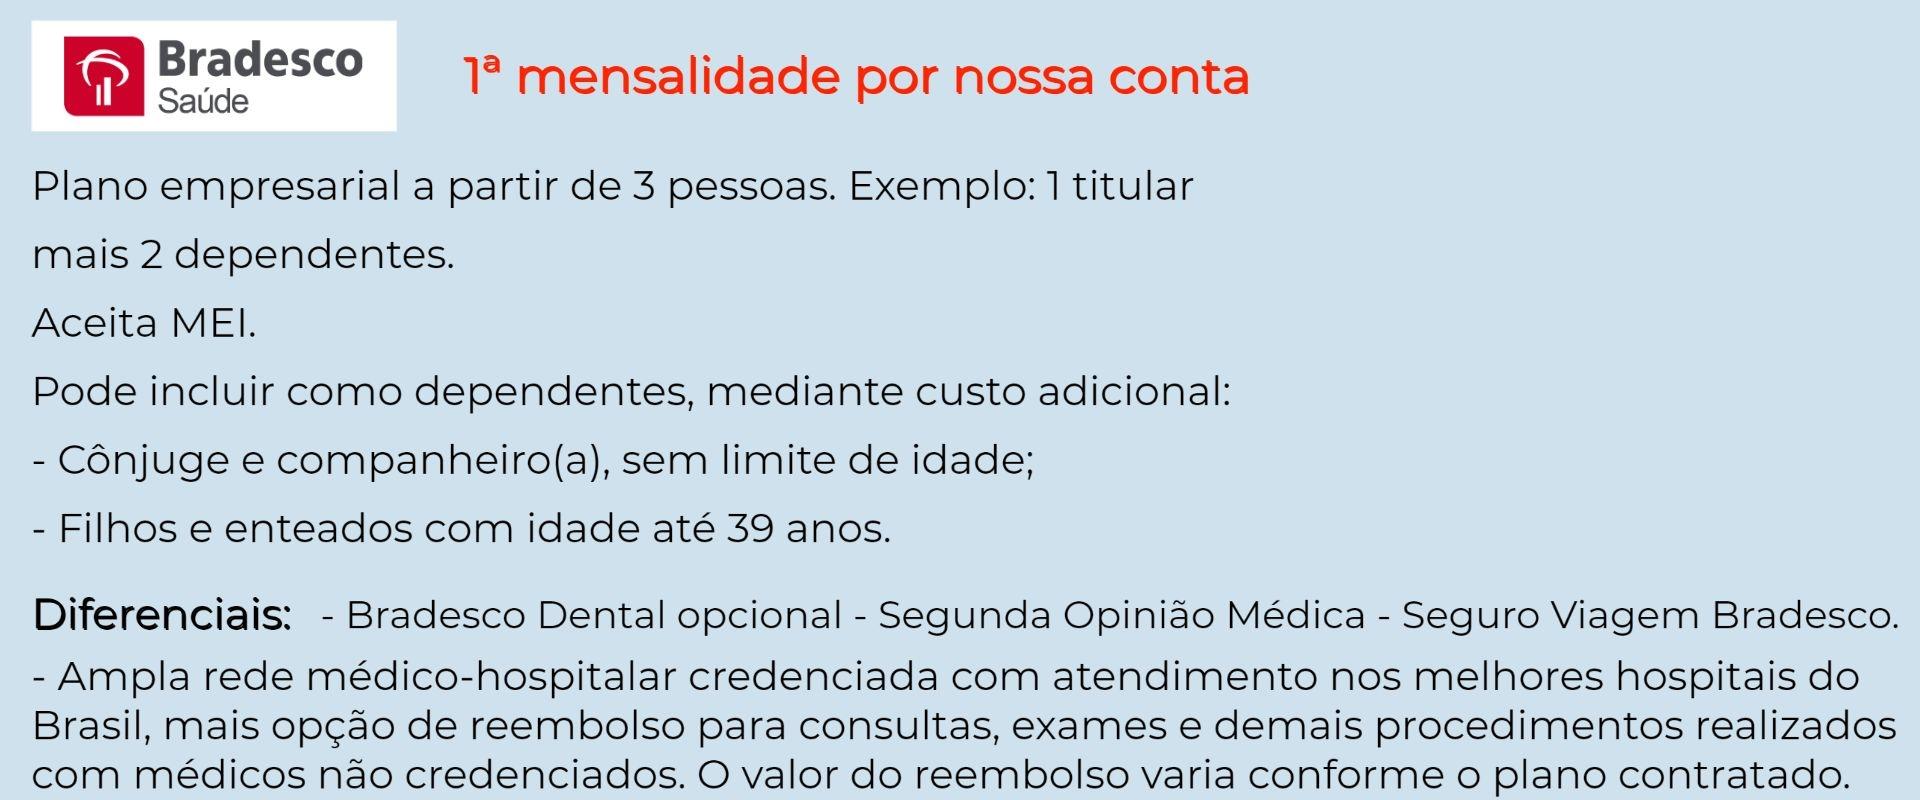 Bradesco Saúde Empresarial - Guaratinguetá